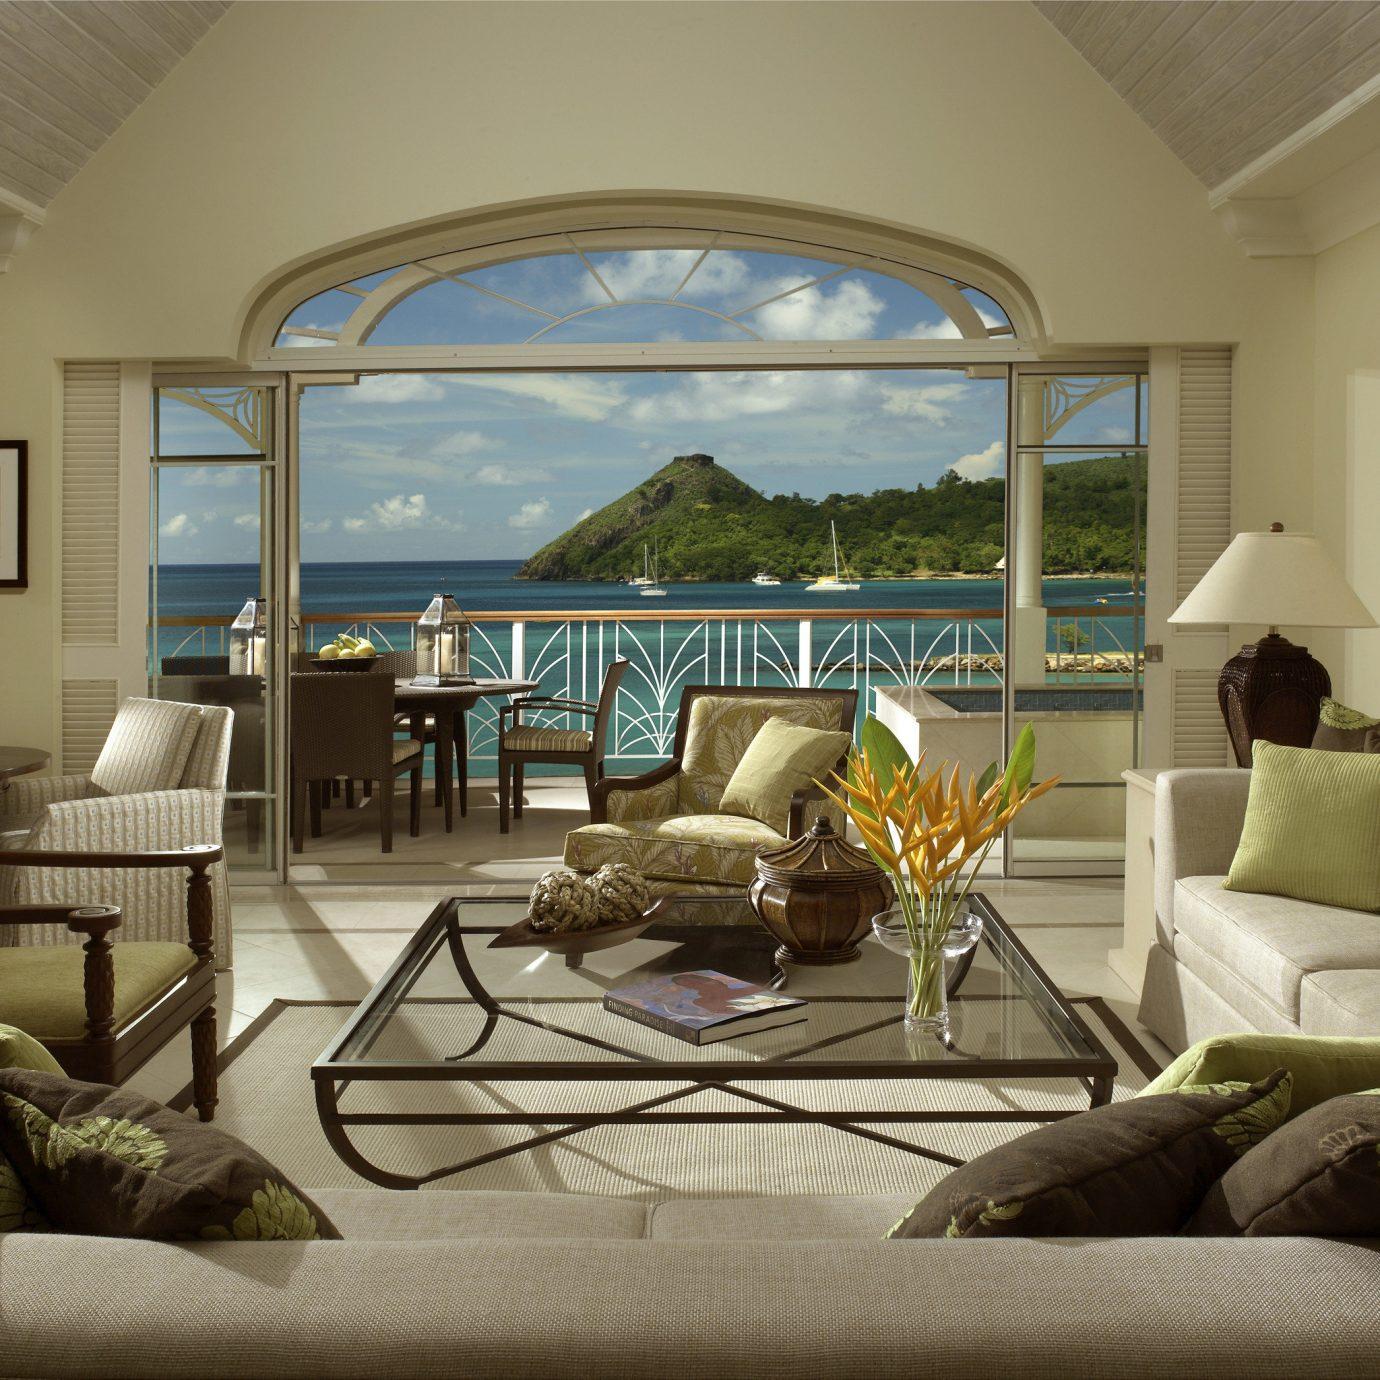 Beach Beachfront Classic Hotels Island Suite sofa living room property home condominium cottage mansion Villa